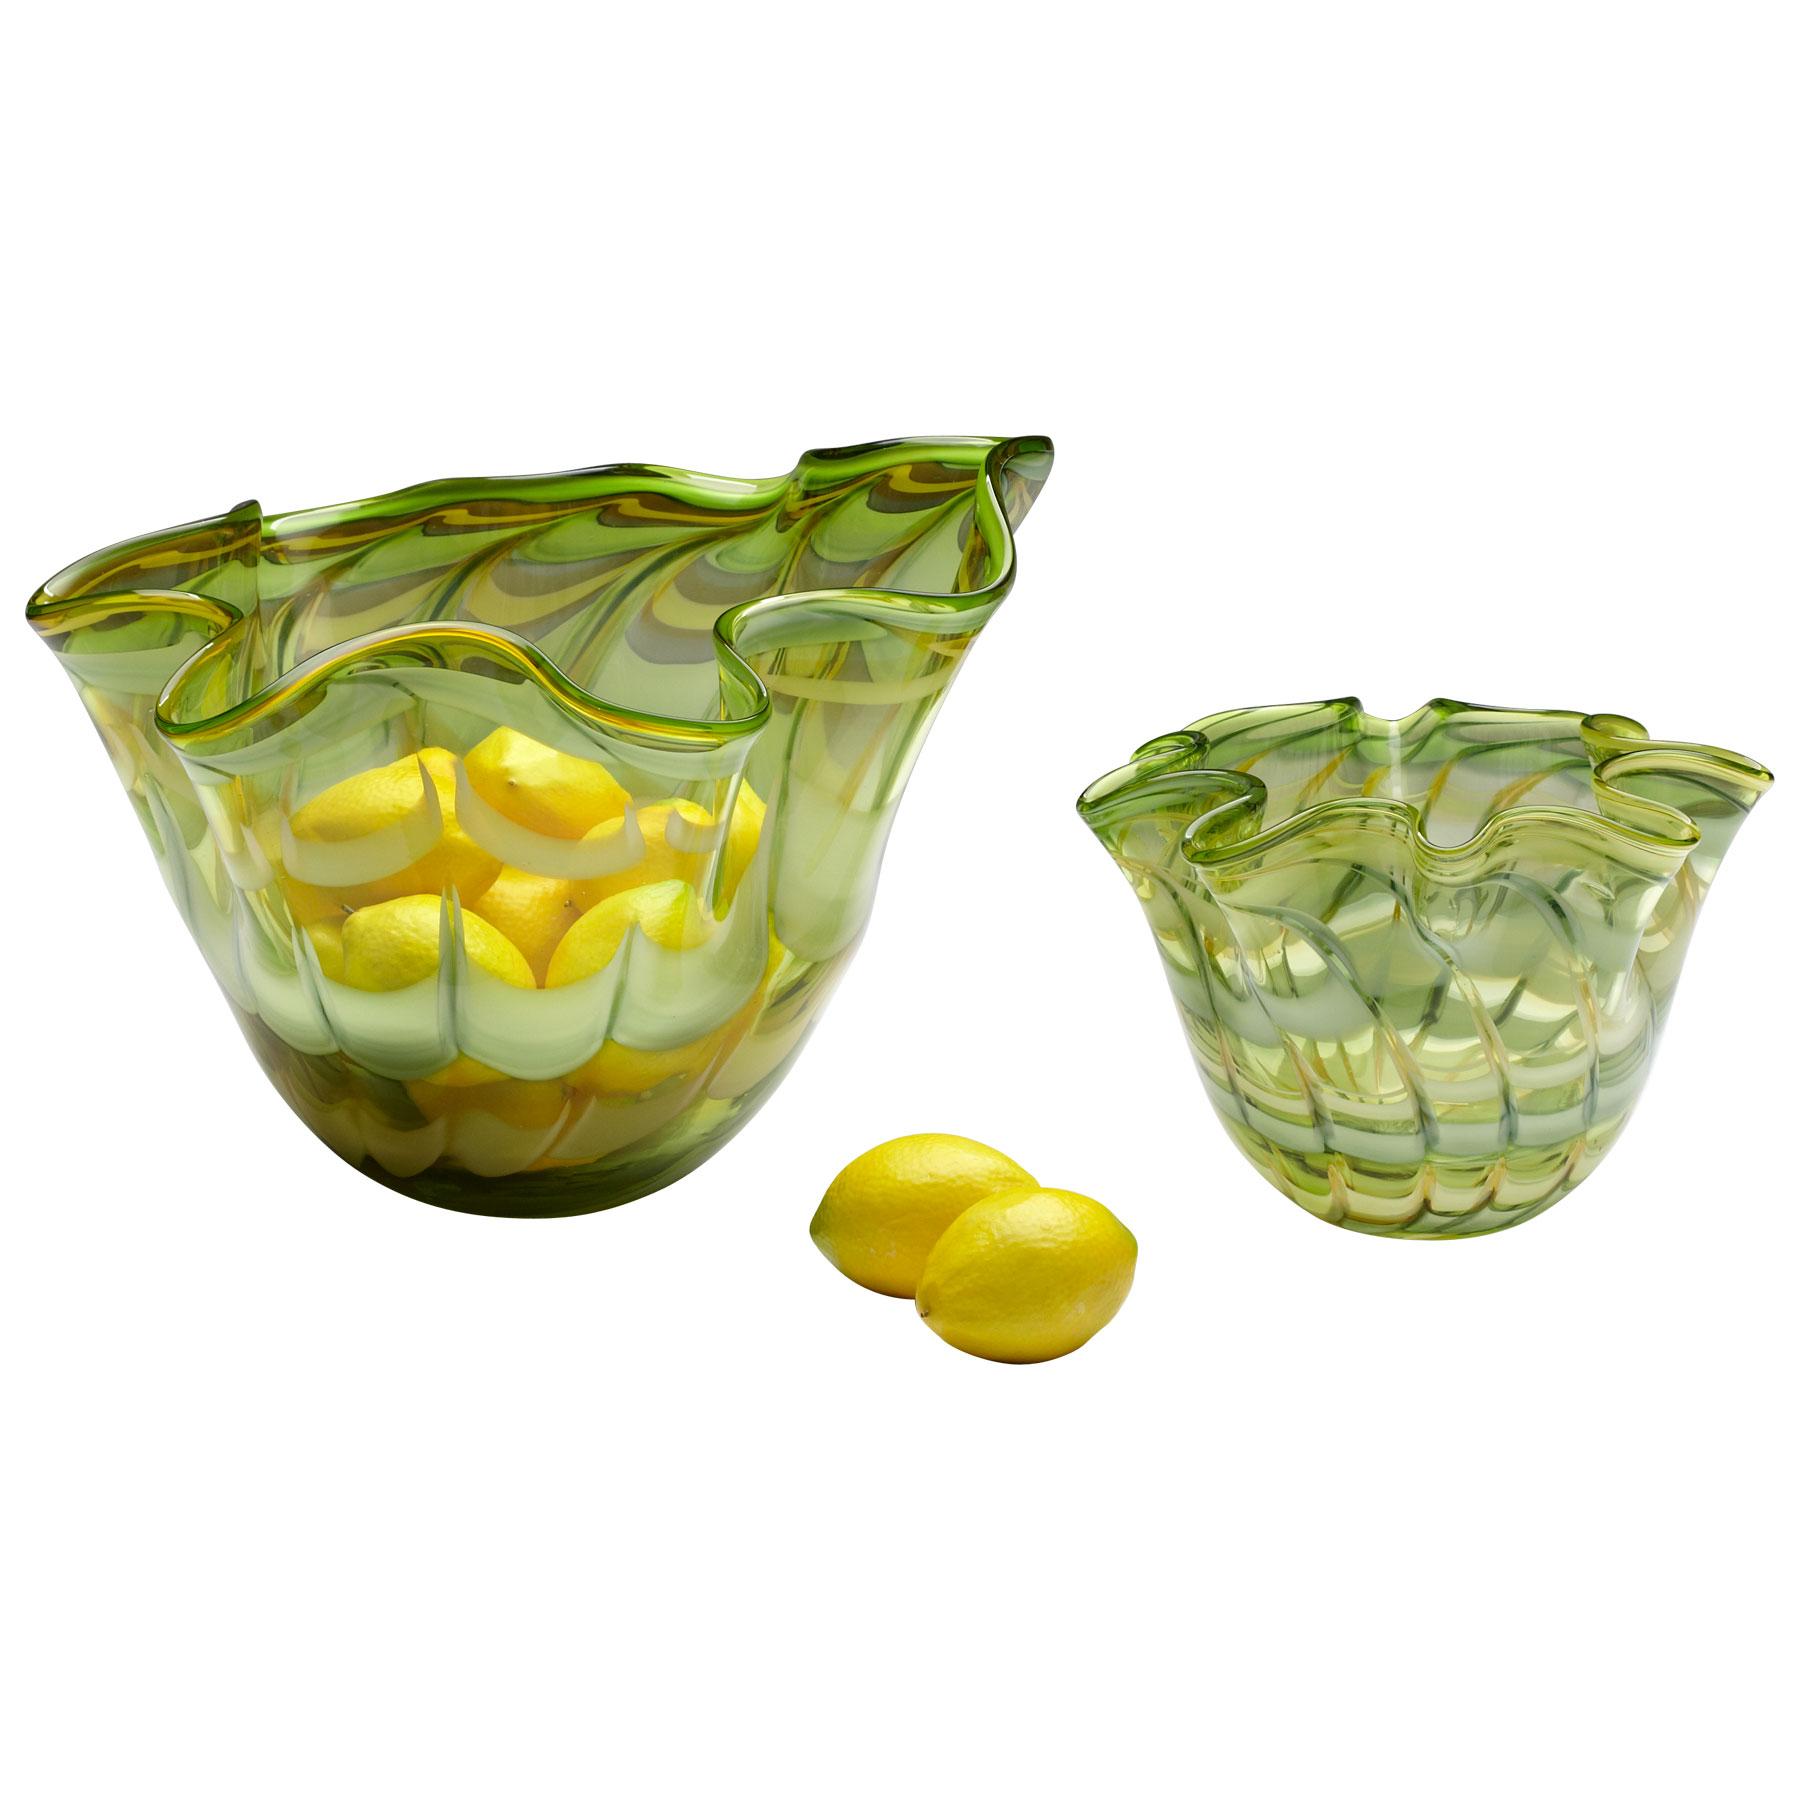 Coastal Beach Light Green Yellow Scalloped Edge Glass Fruit Bowl - 9